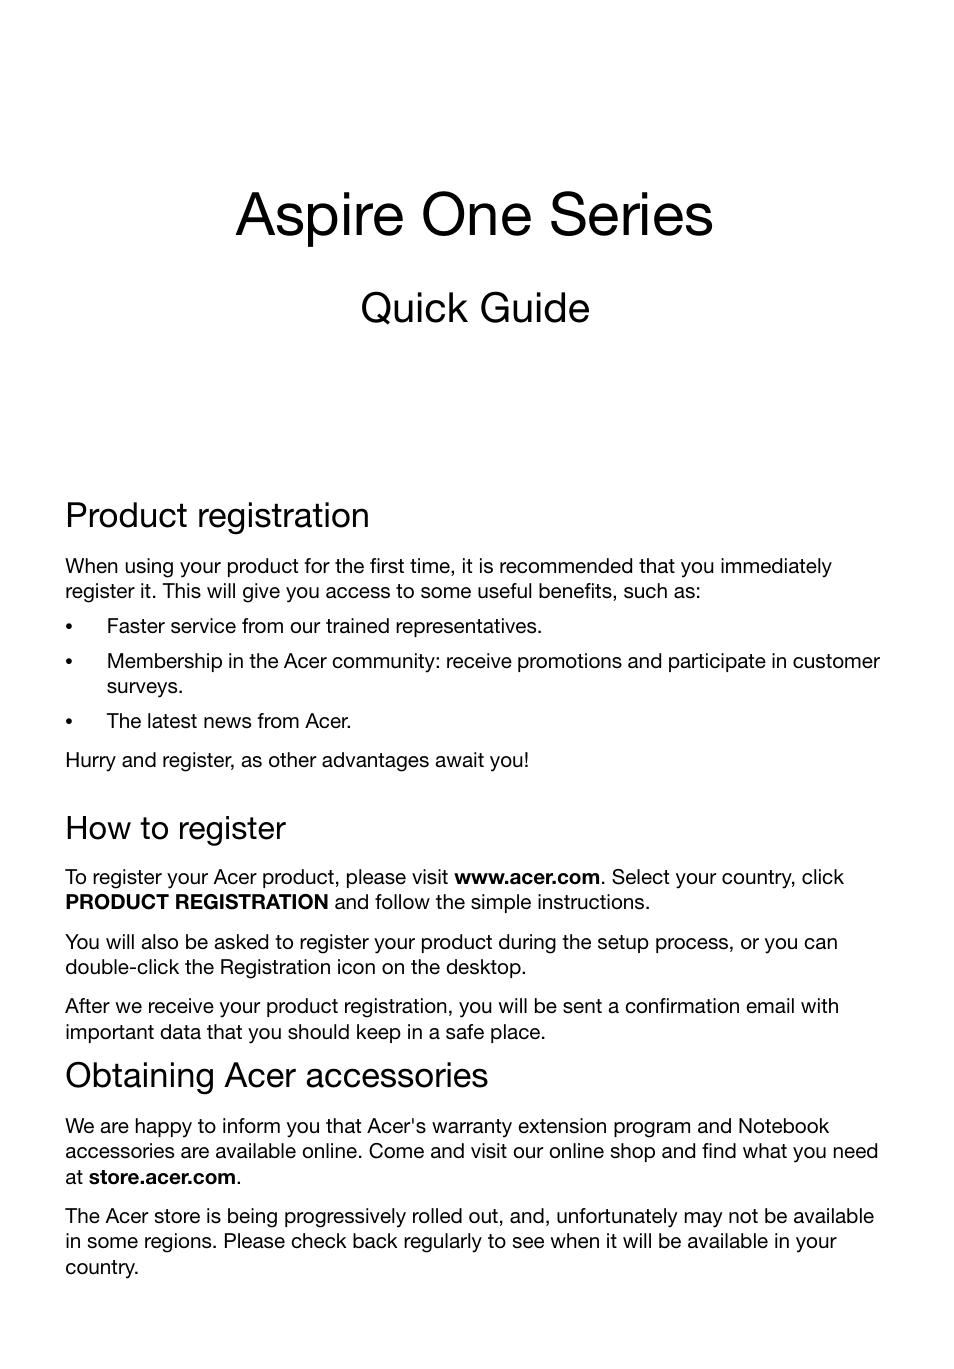 acer ao725 user manual 9 pages also for aspire v5 121 rh manualsdir com Quick Start Guide Quick Guide Template